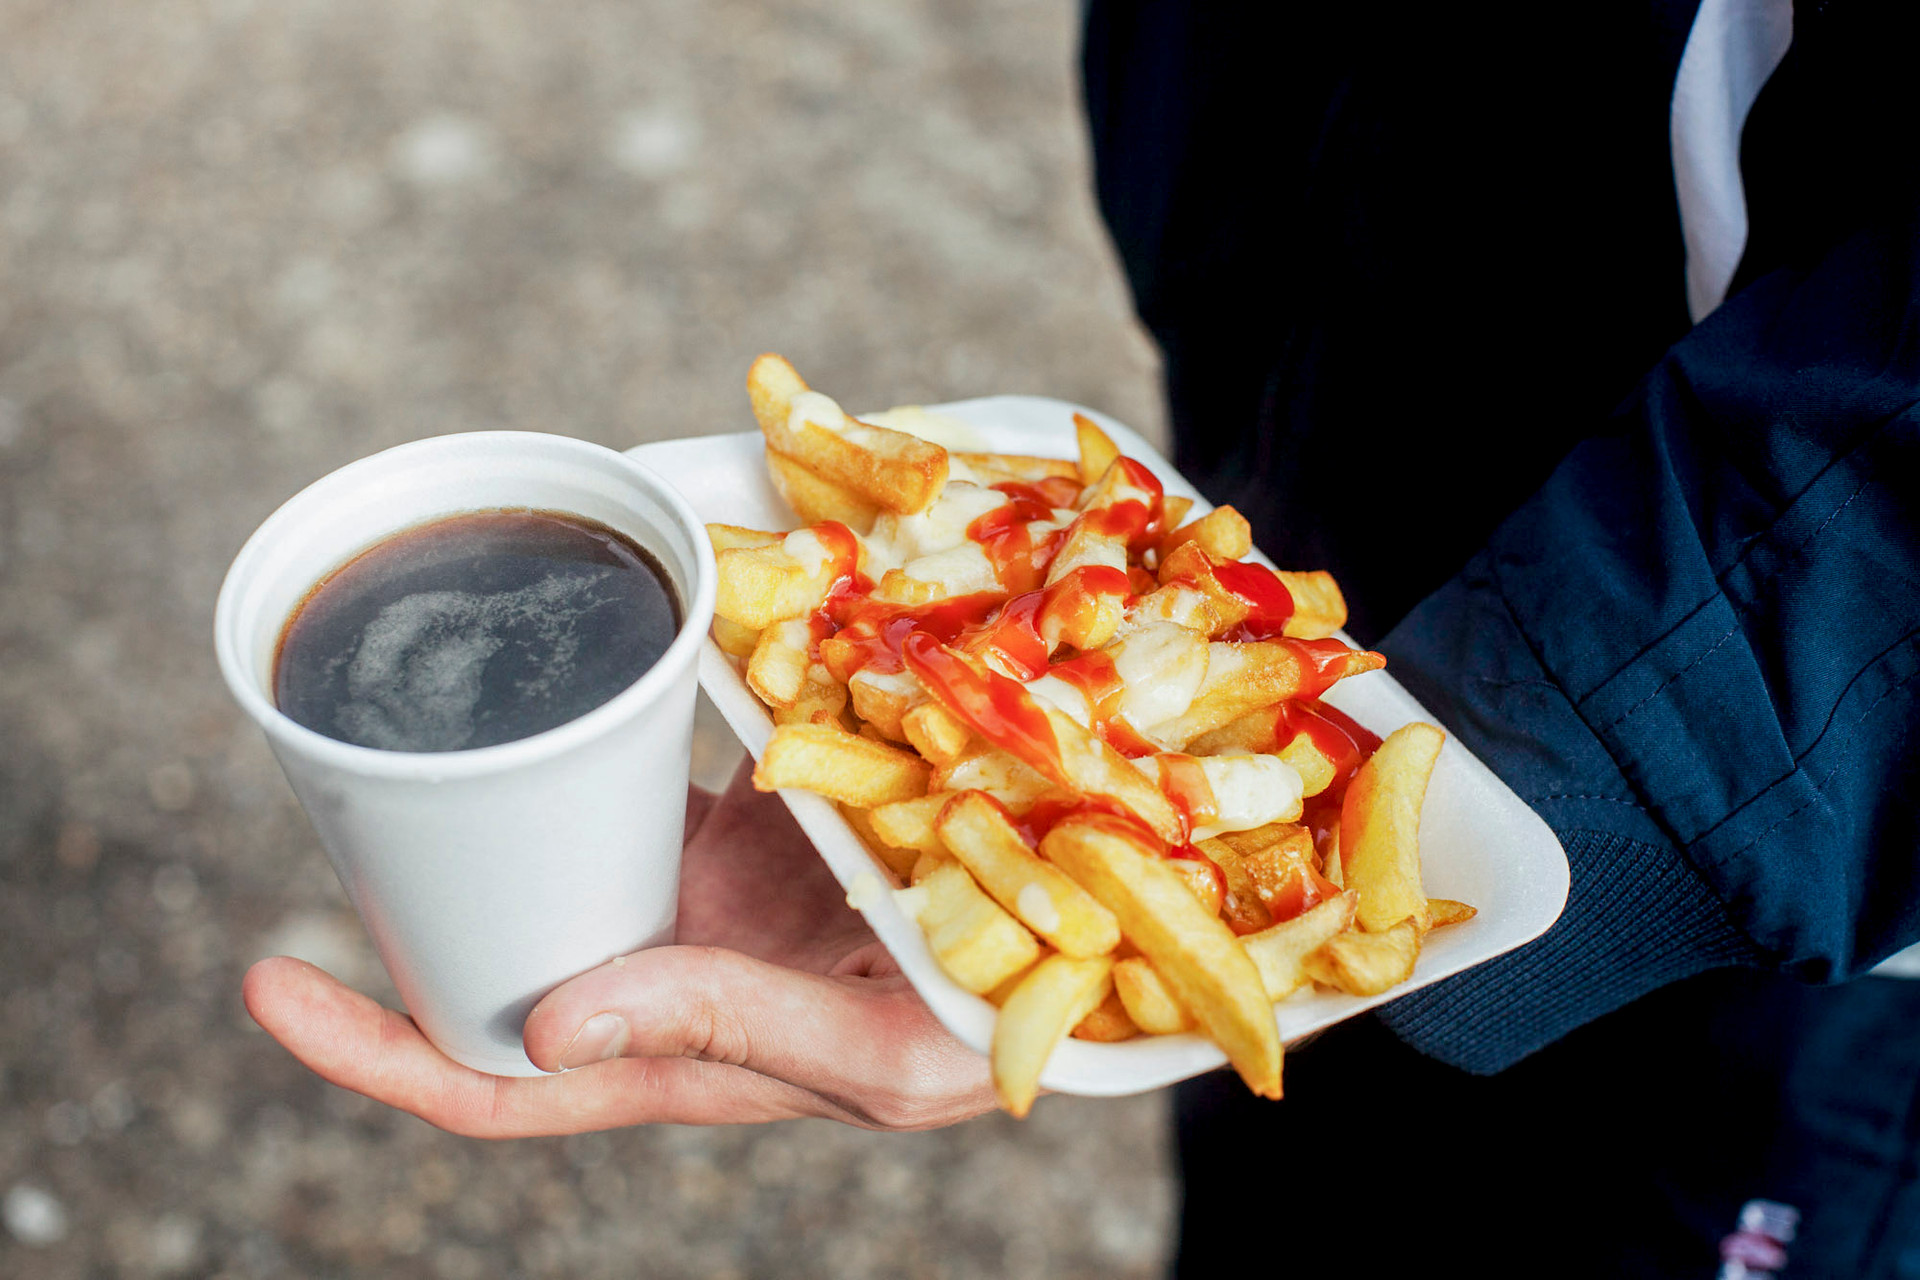 fries and tea